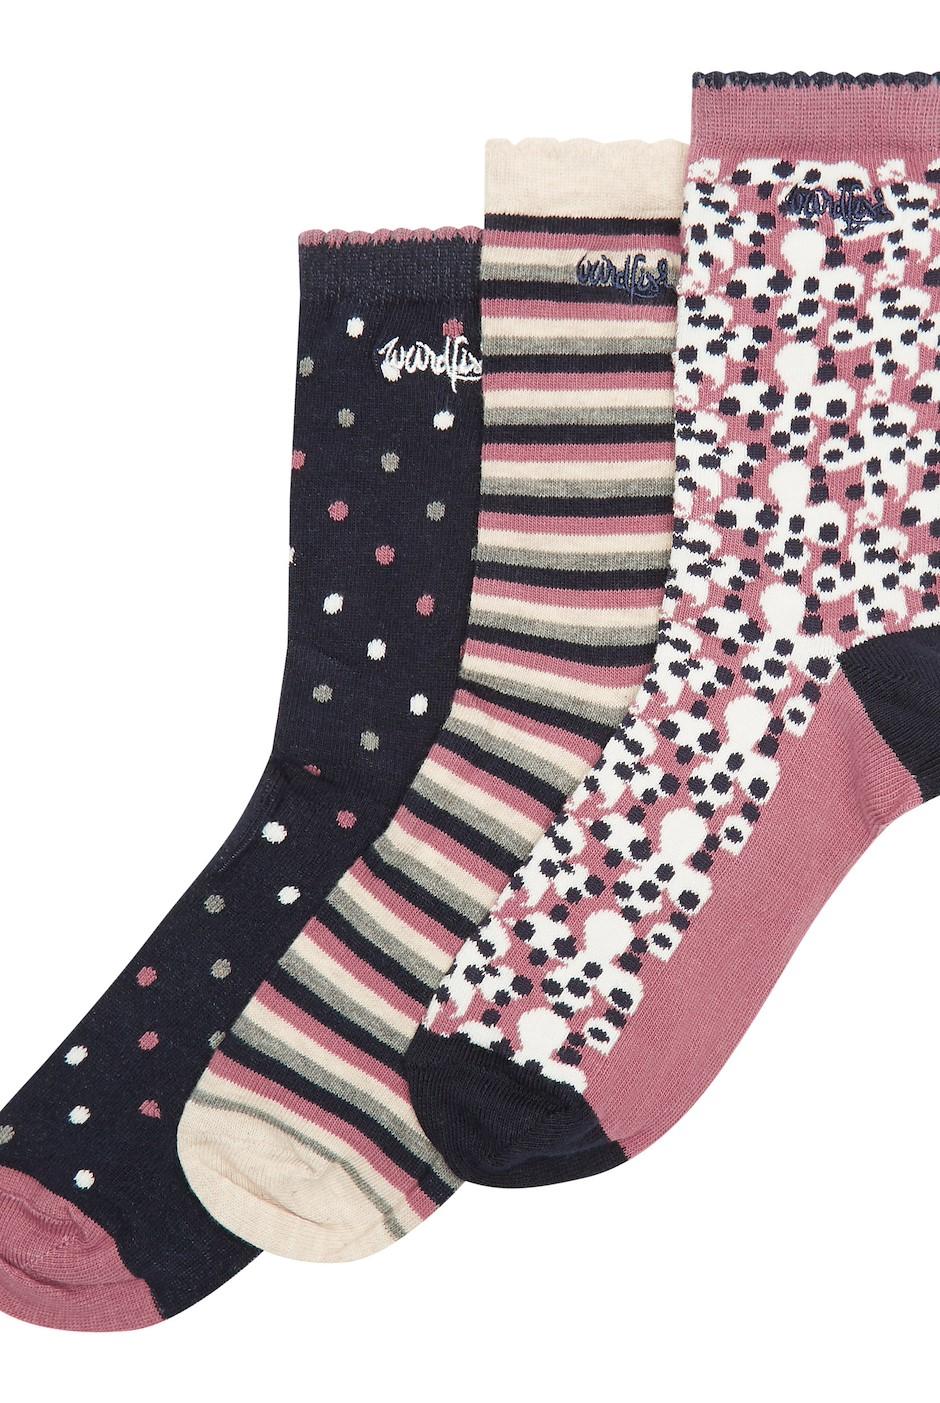 Parade Patterned Sock 3 Pack Magenta